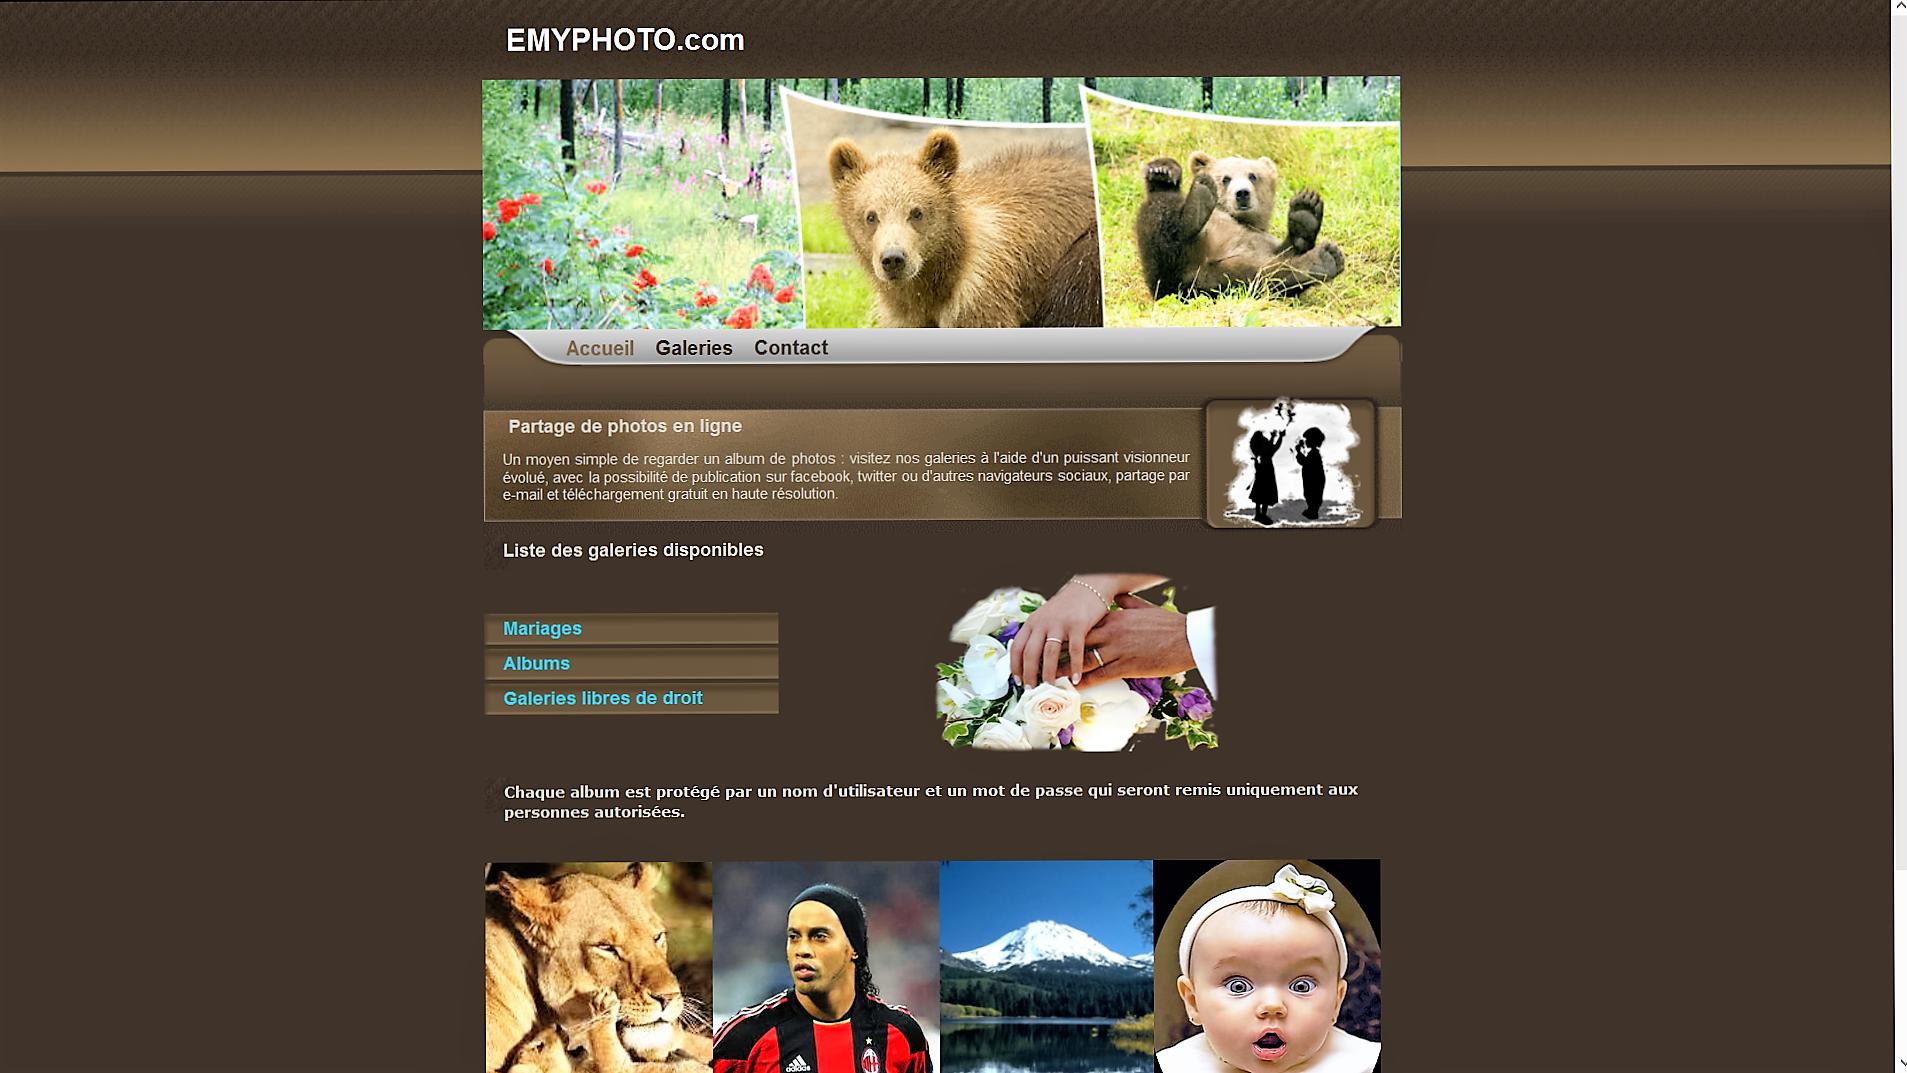 Emyphoto2